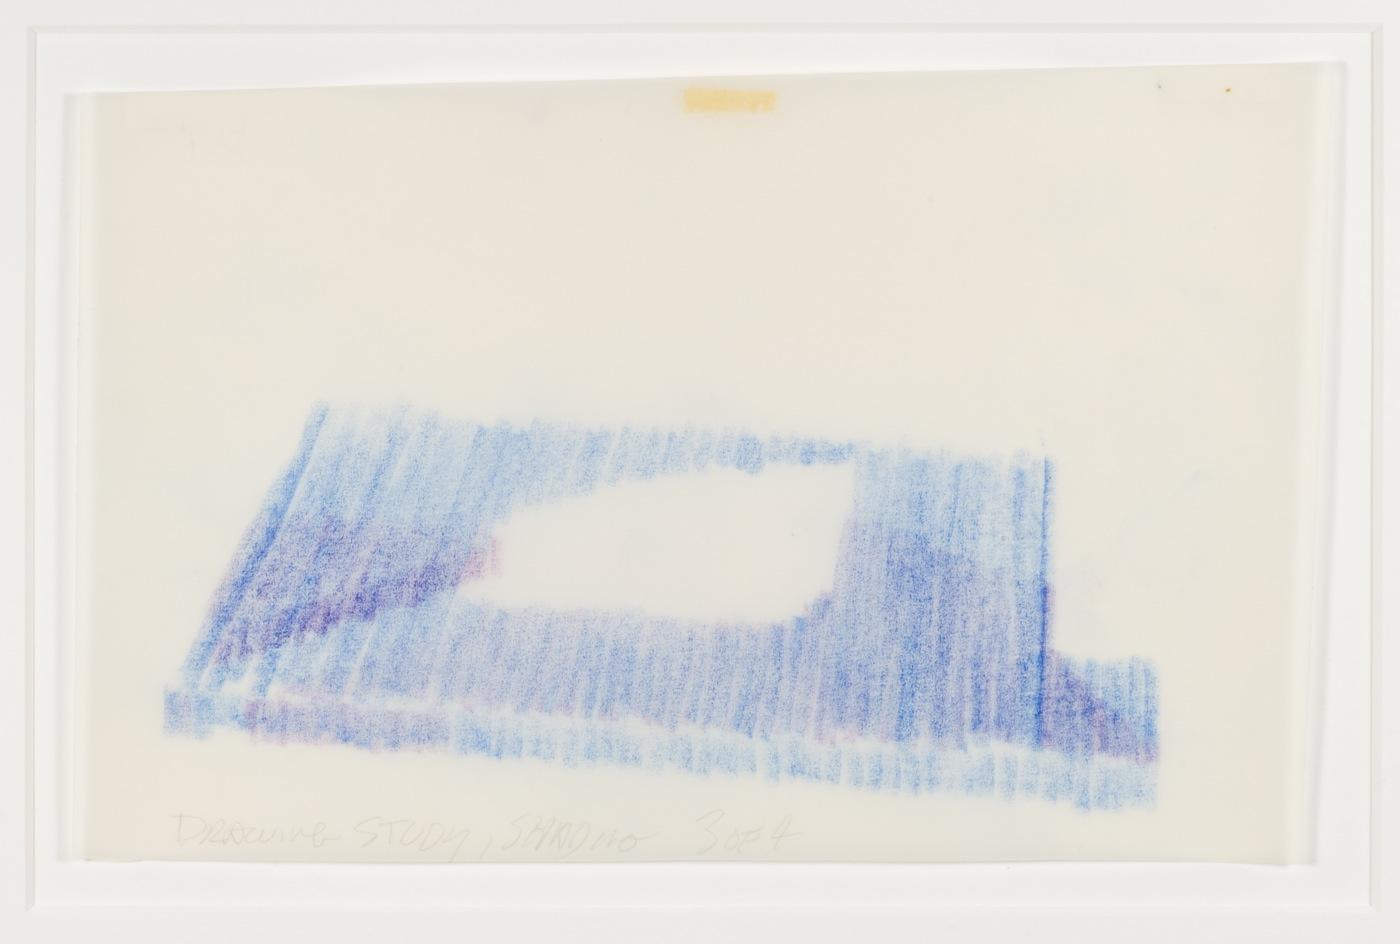 Max Neuhaus, Drawing Study, Shading, Spatial Interlock, Three to One, 1992